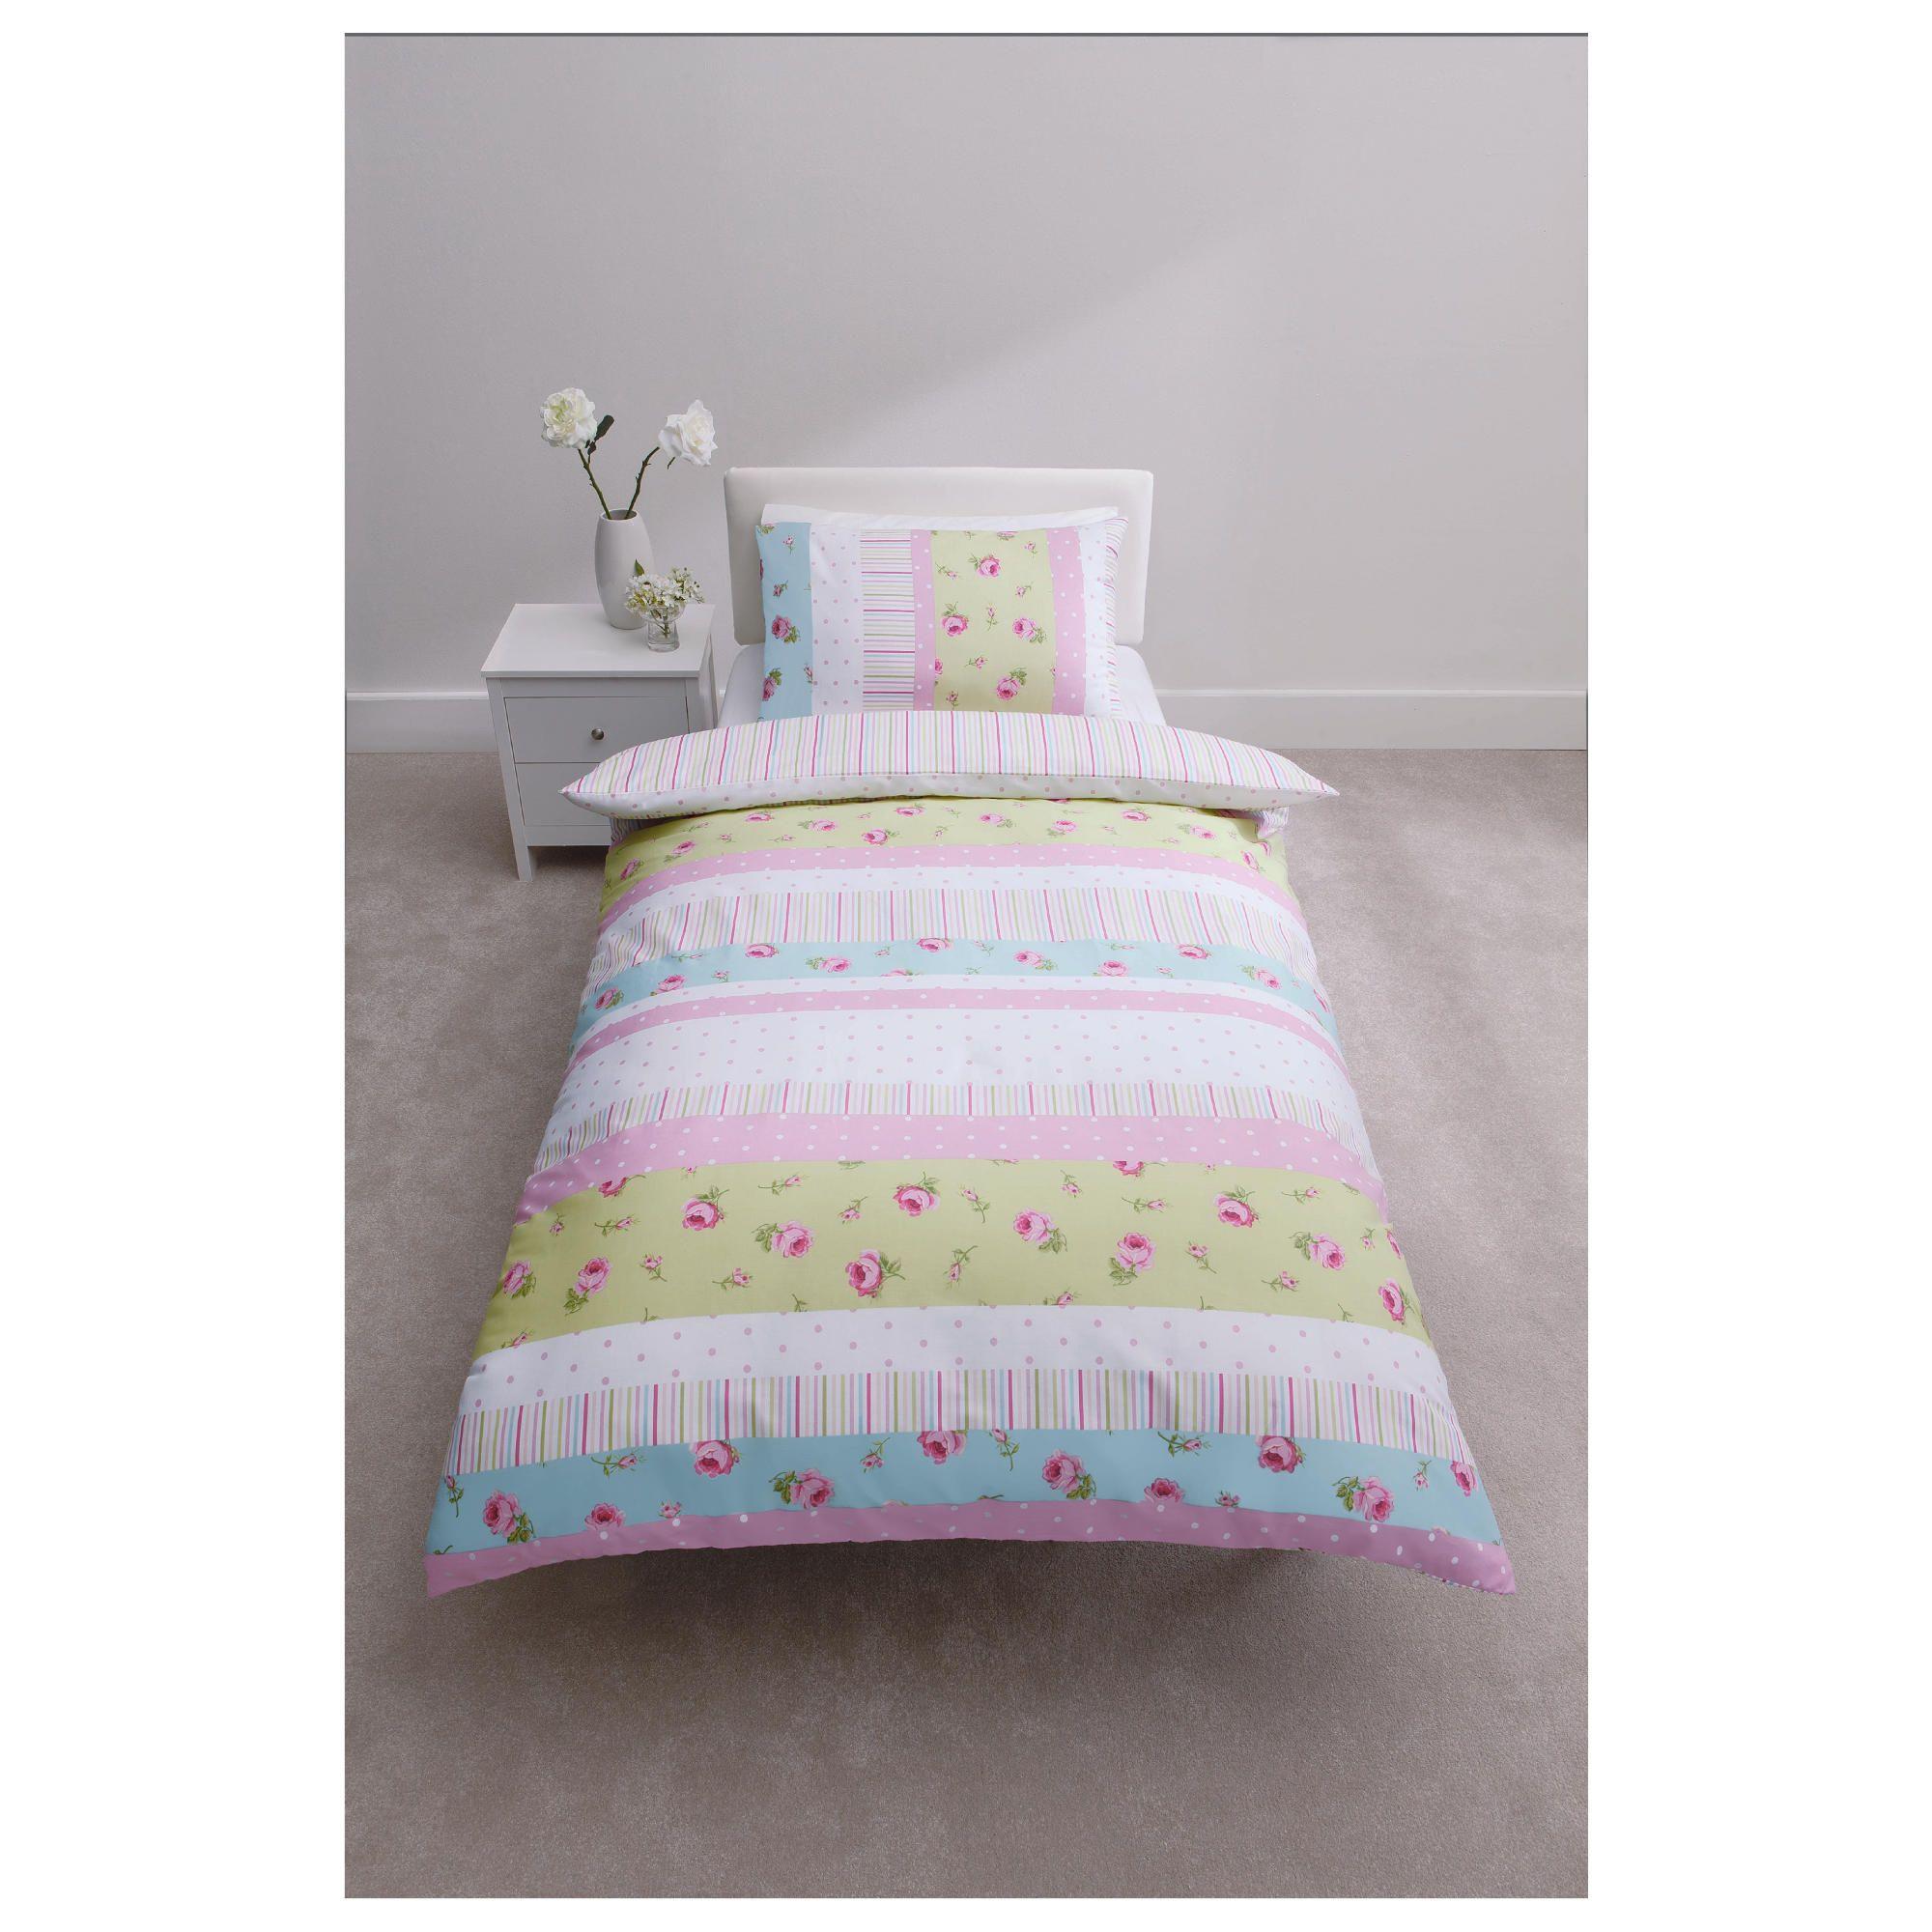 tesco rosebud duvet cover set single. Black Bedroom Furniture Sets. Home Design Ideas